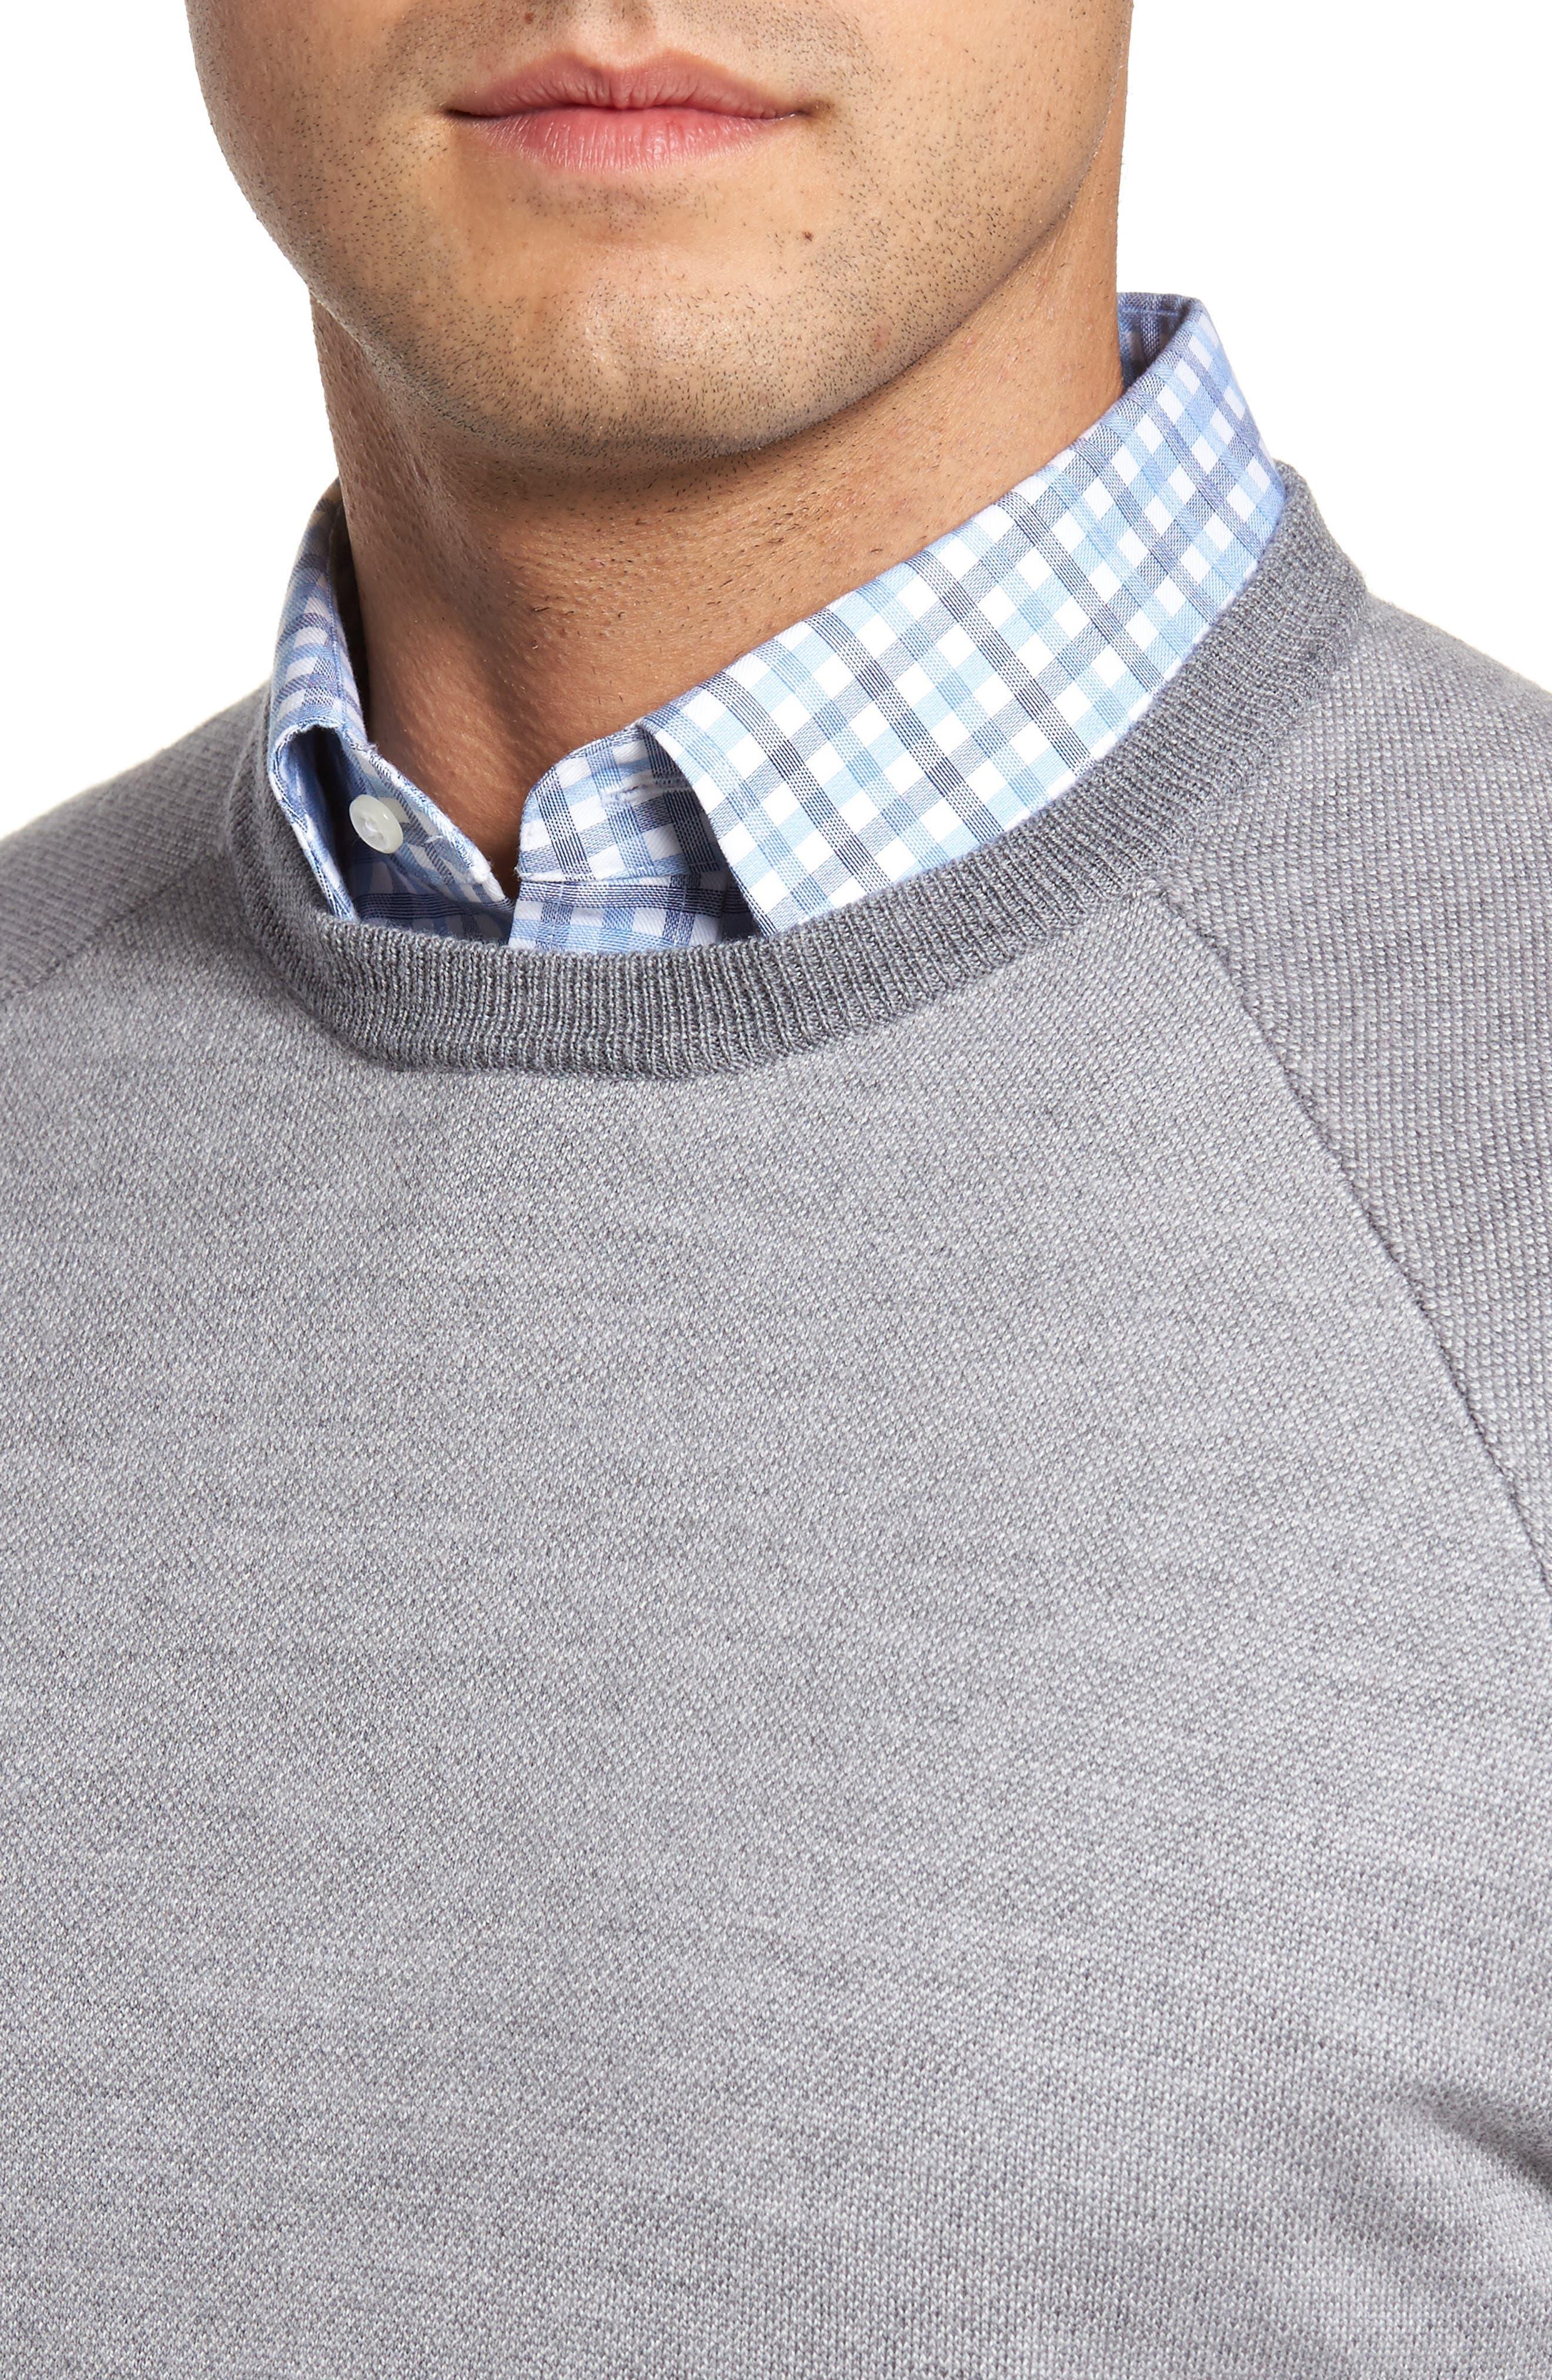 Soltice Merino Sweater,                             Alternate thumbnail 4, color,                             029